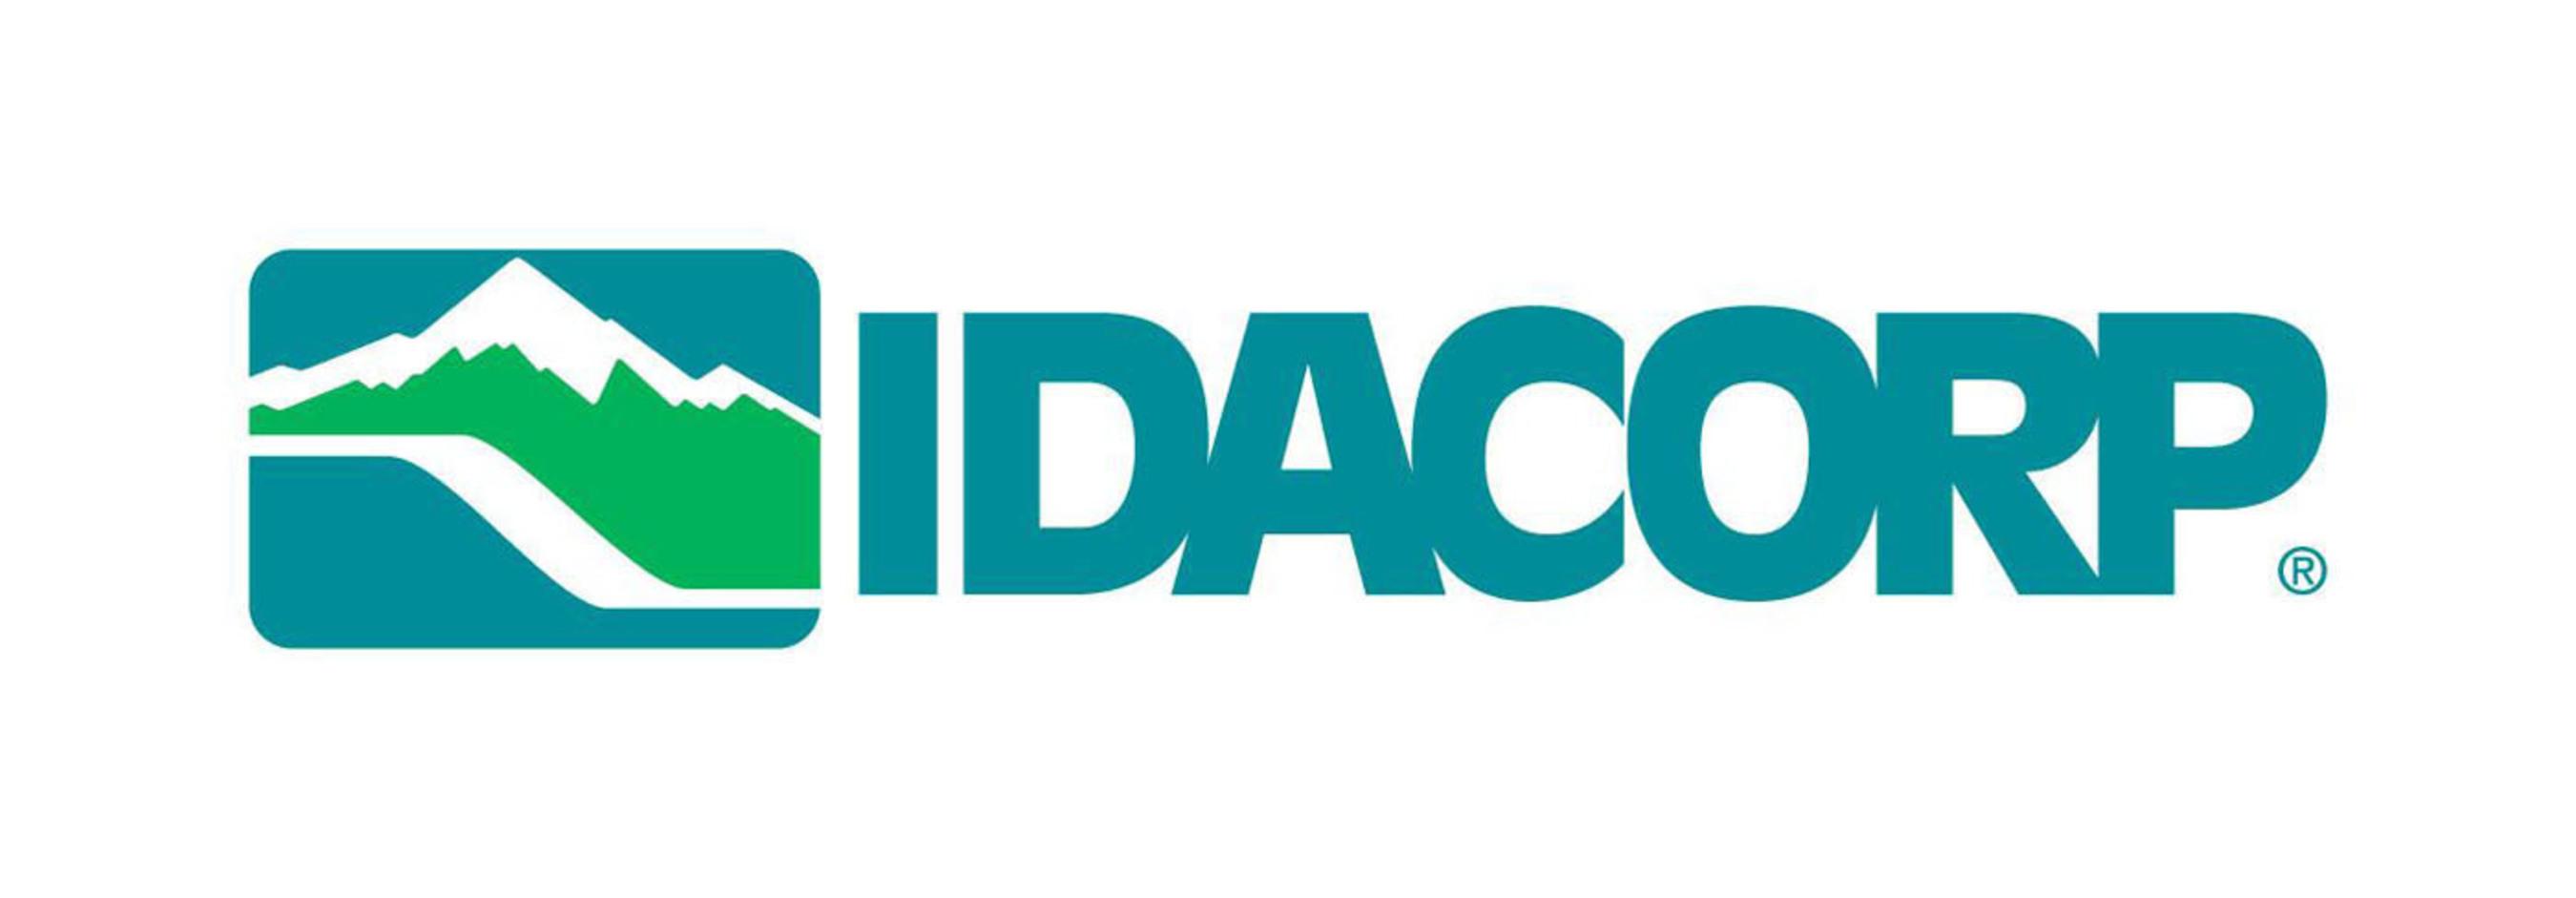 IDACORP, Inc. logo. (PRNewsFoto/IDACORP, Inc.)